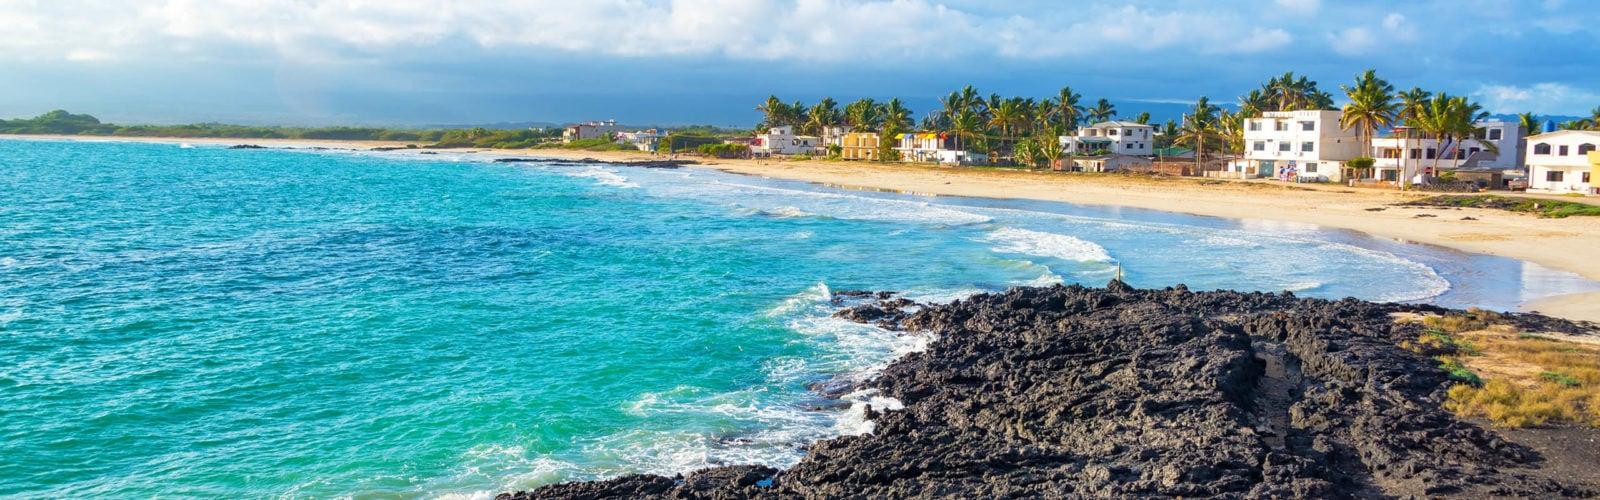 beach-isabela-island-galapagos